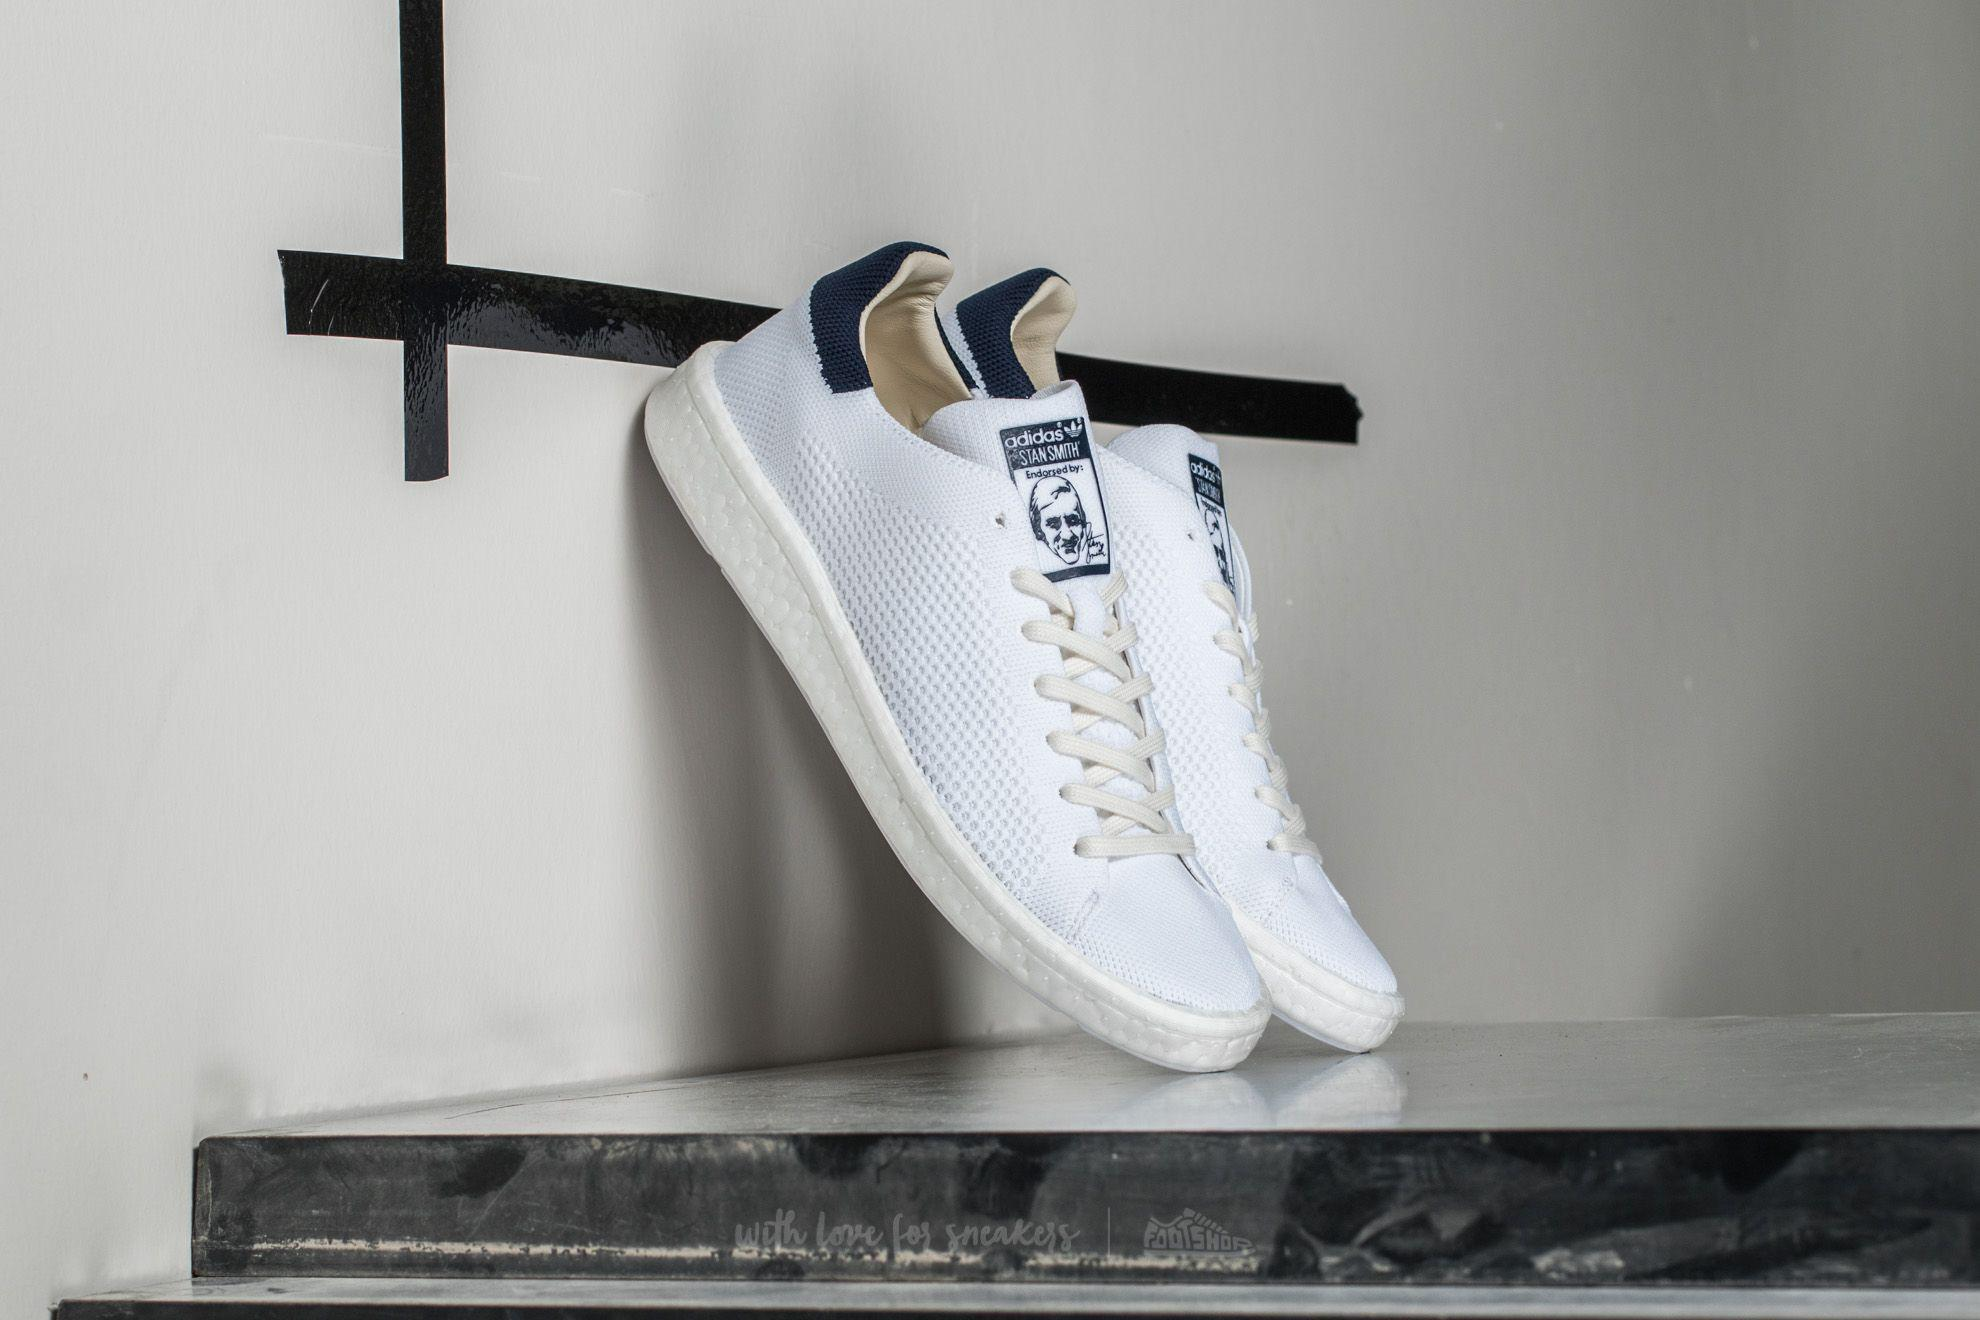 Lyst - adidas Originals Adidas Stan Smith Primeknit Ftw White   Ftw ... d1f48db3e